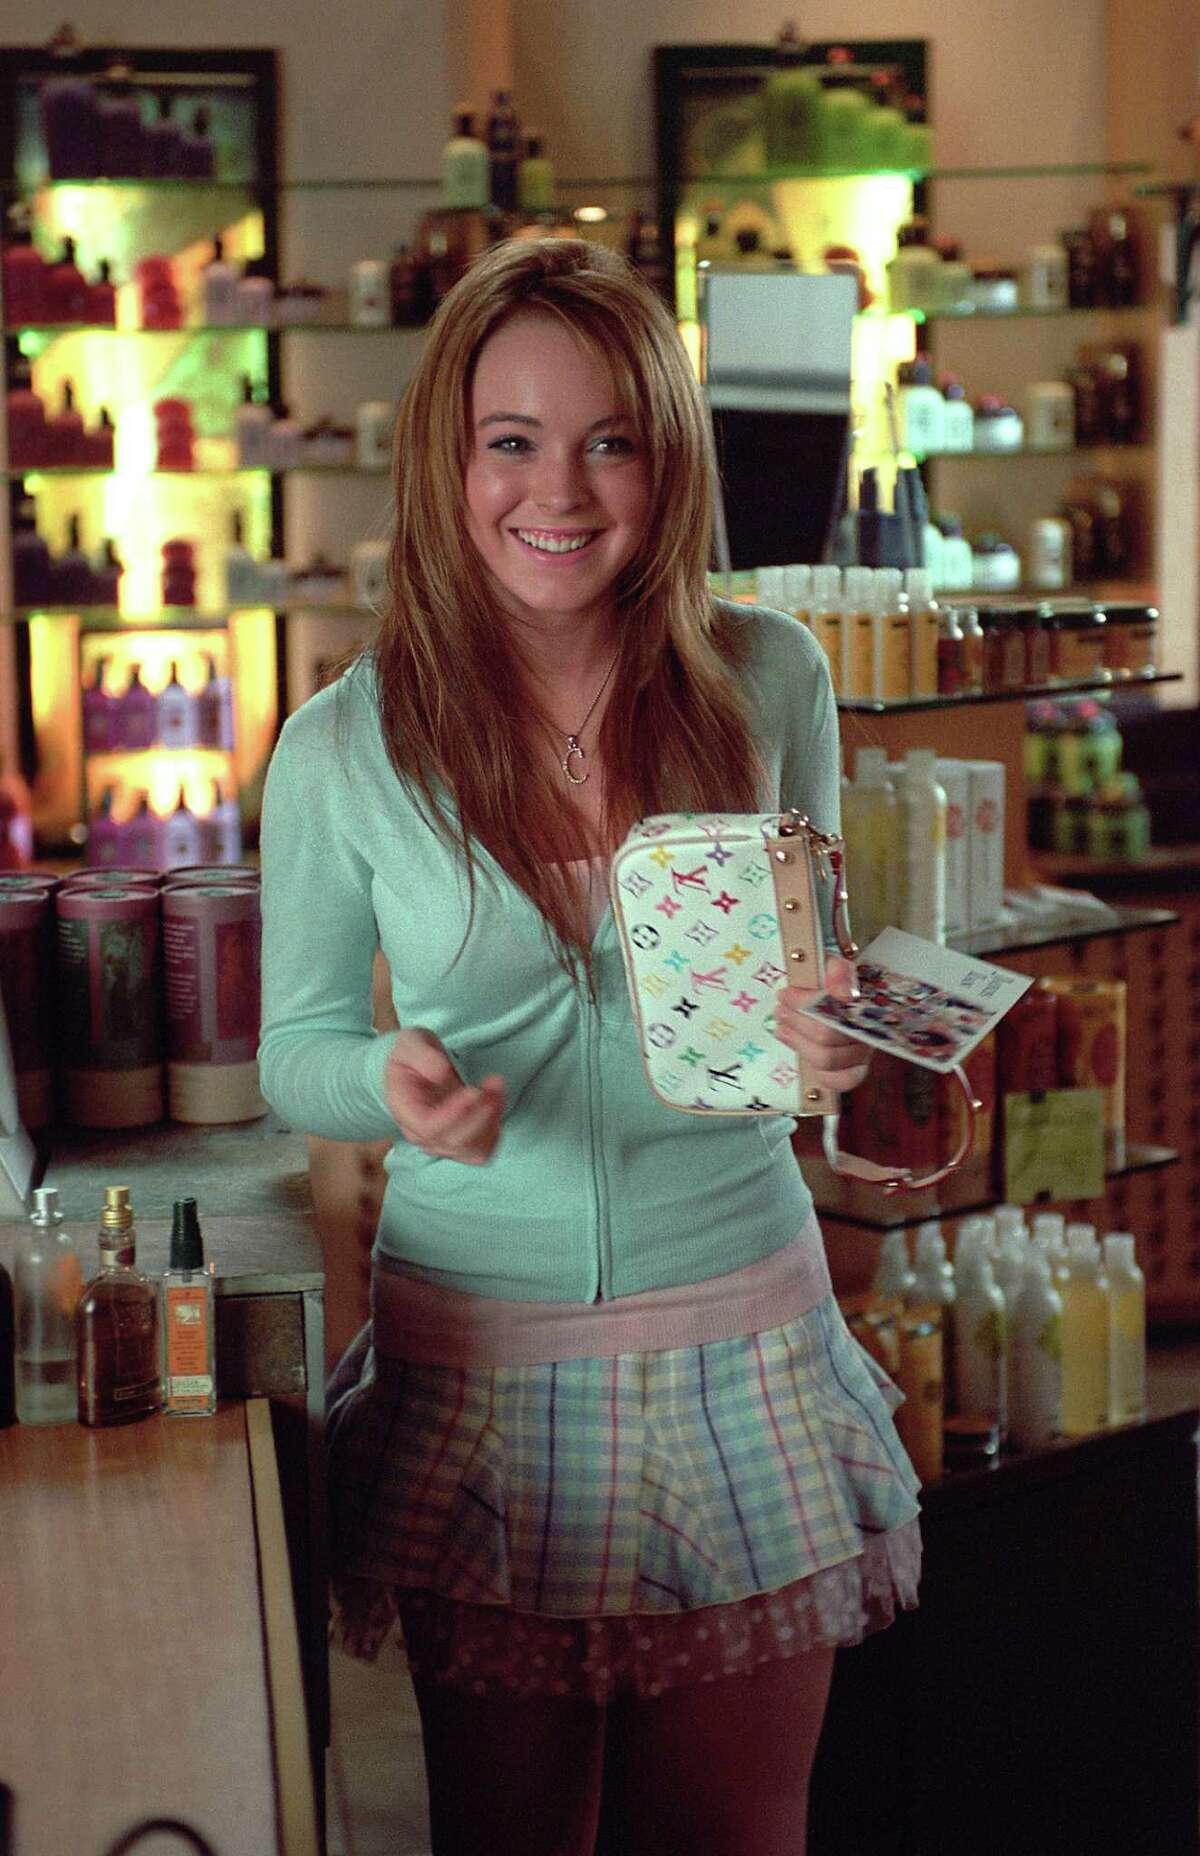 Lindsay Lohan as Cady in